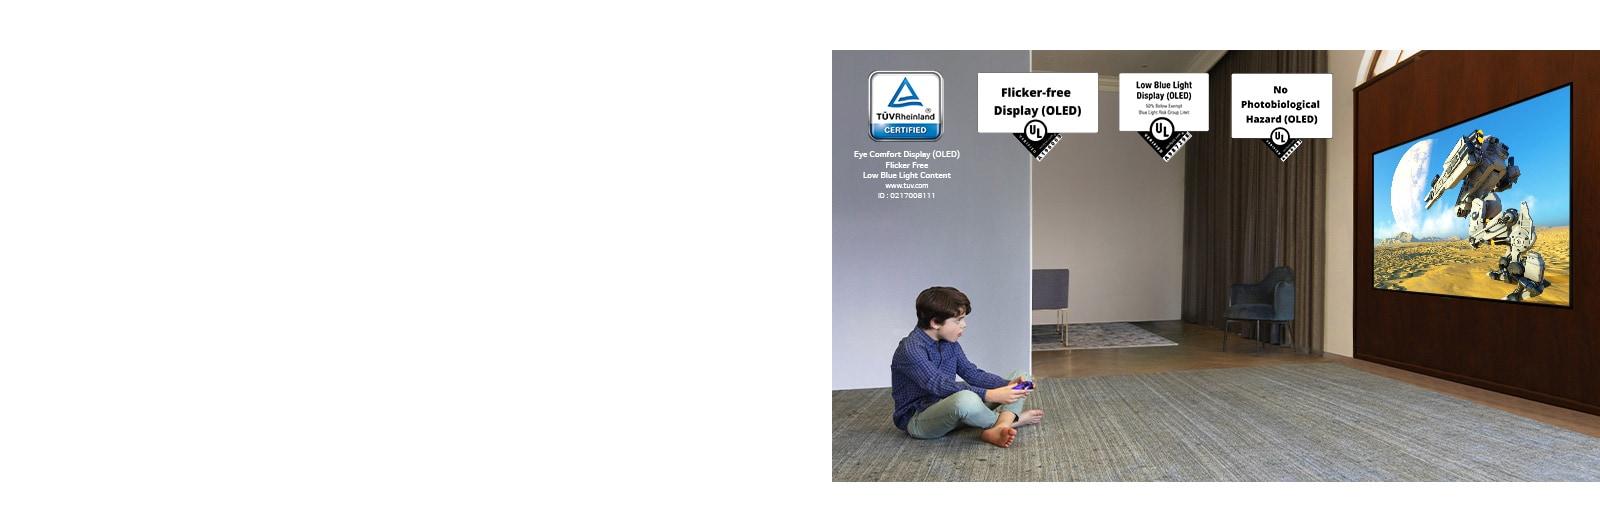 Dijete koje leži na podu, drži džojstik i igra videoigru na zaslonu televizora